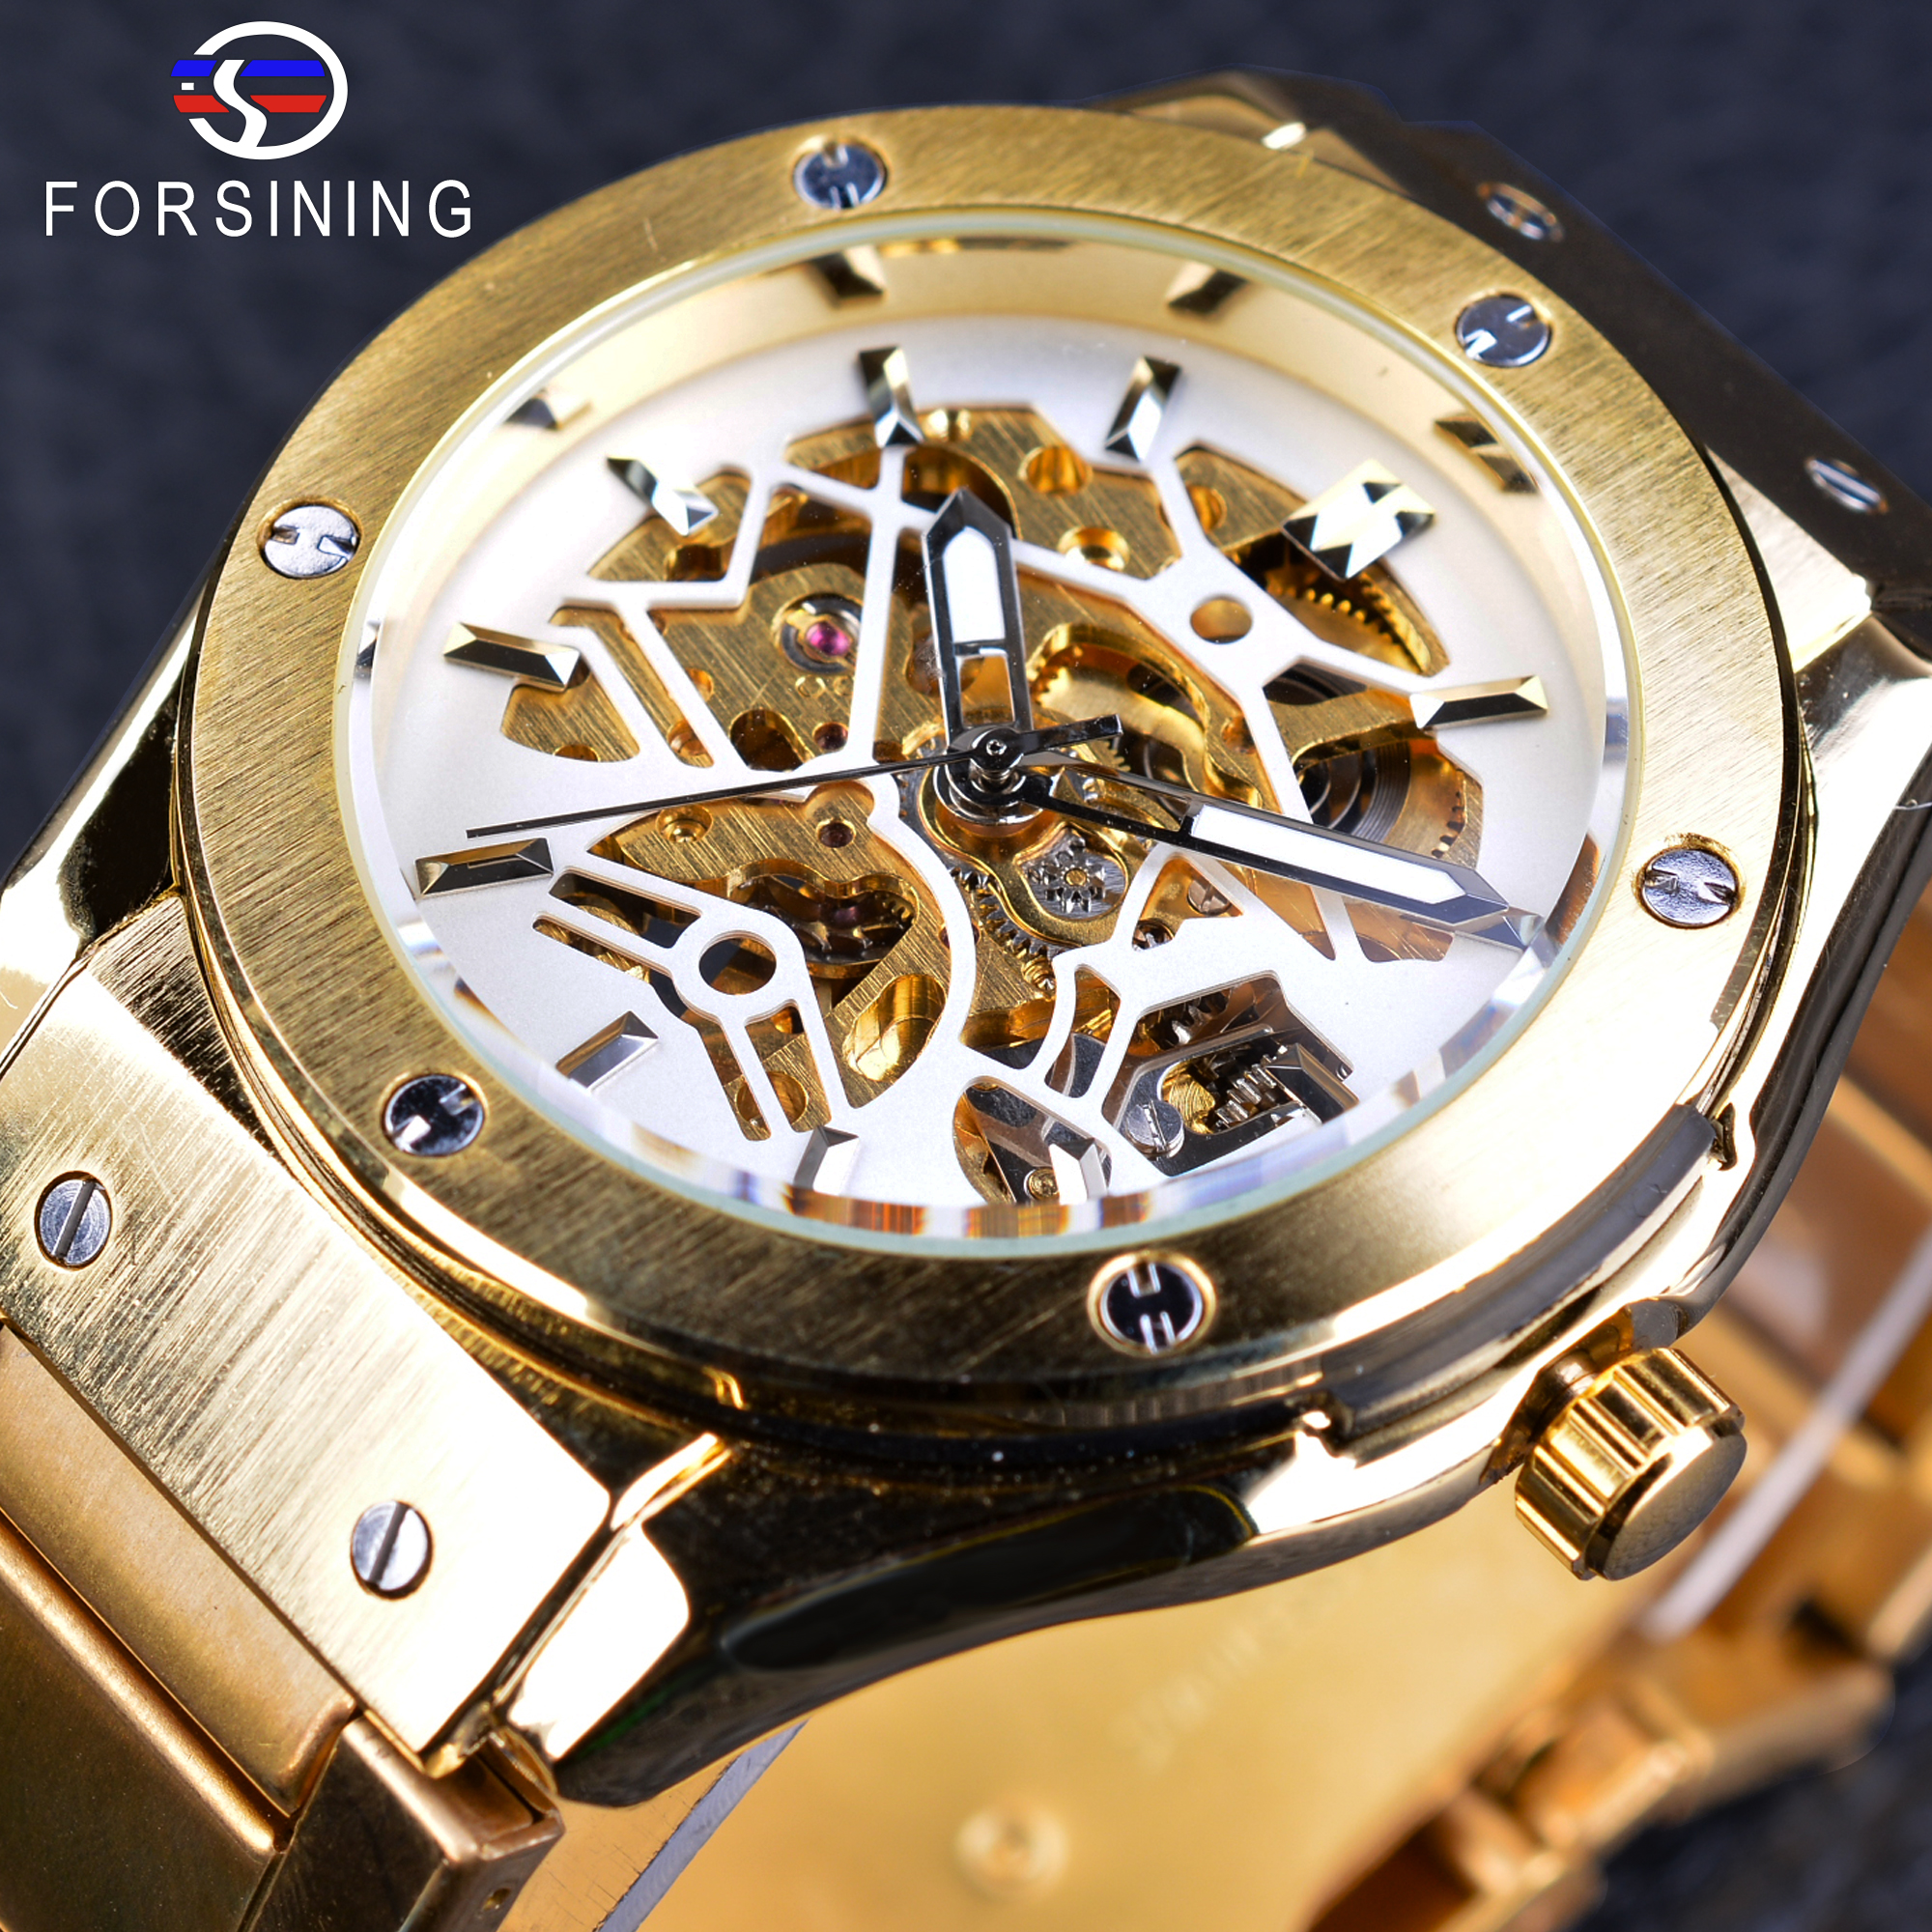 Forsining Golden Stainless Steel Sport Watch Steampunk Men Watch Luminous Openwork Mechanical Watches Folding Clasp with Safety<br>